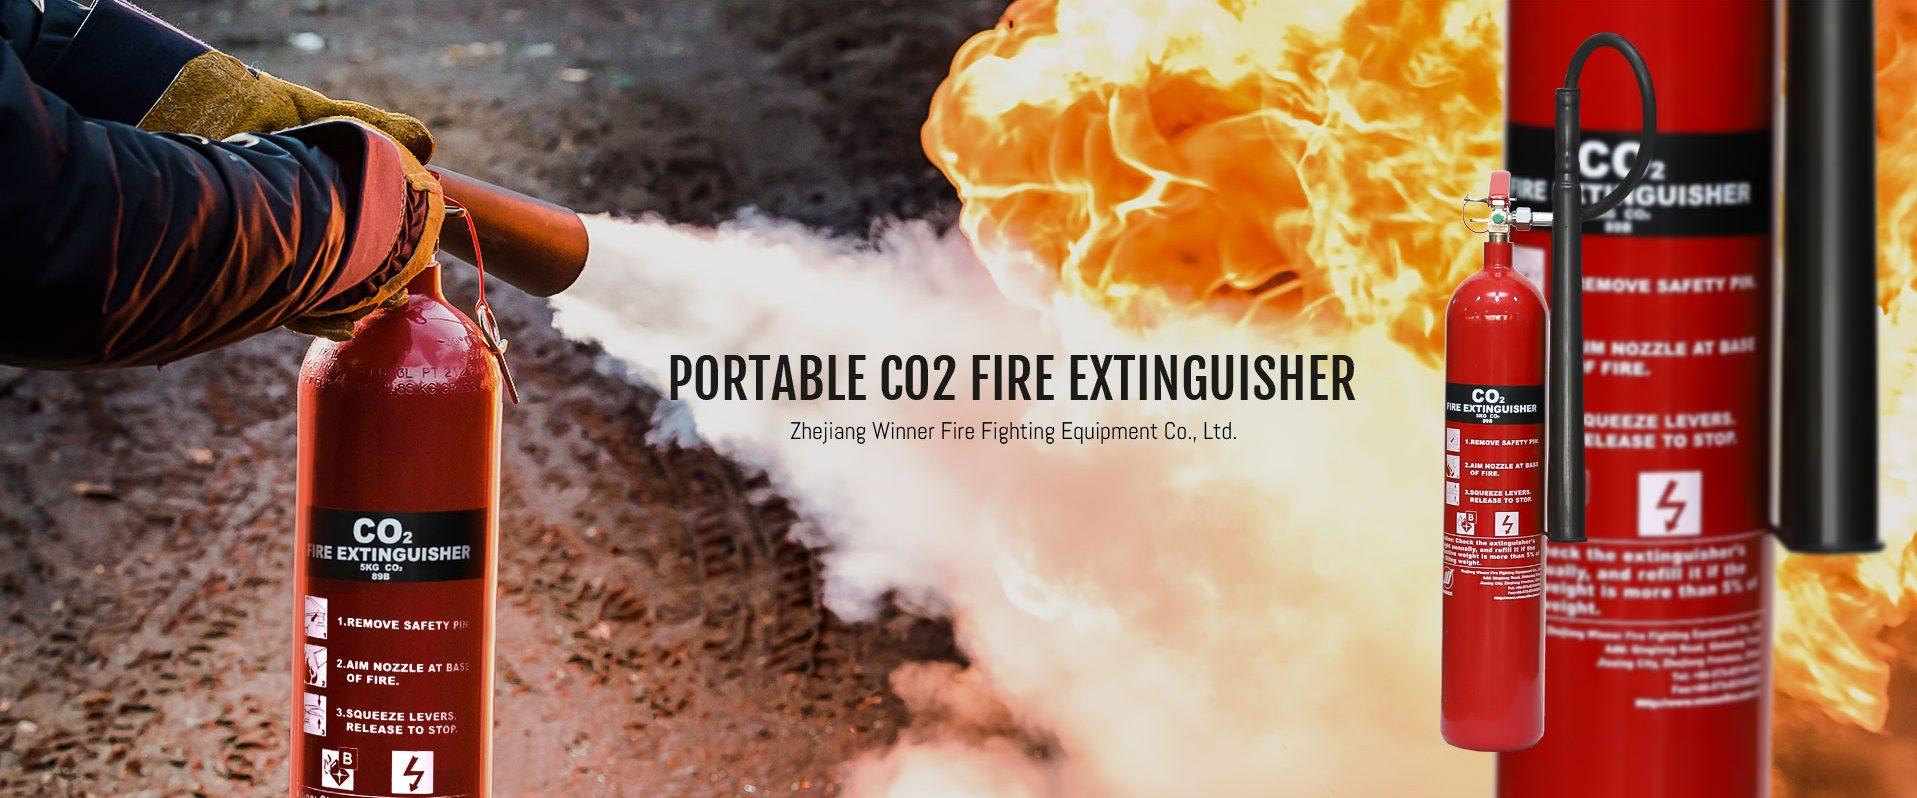 Zhejiang Winner Fire Fighting Equipment Co., Ltd. image 1